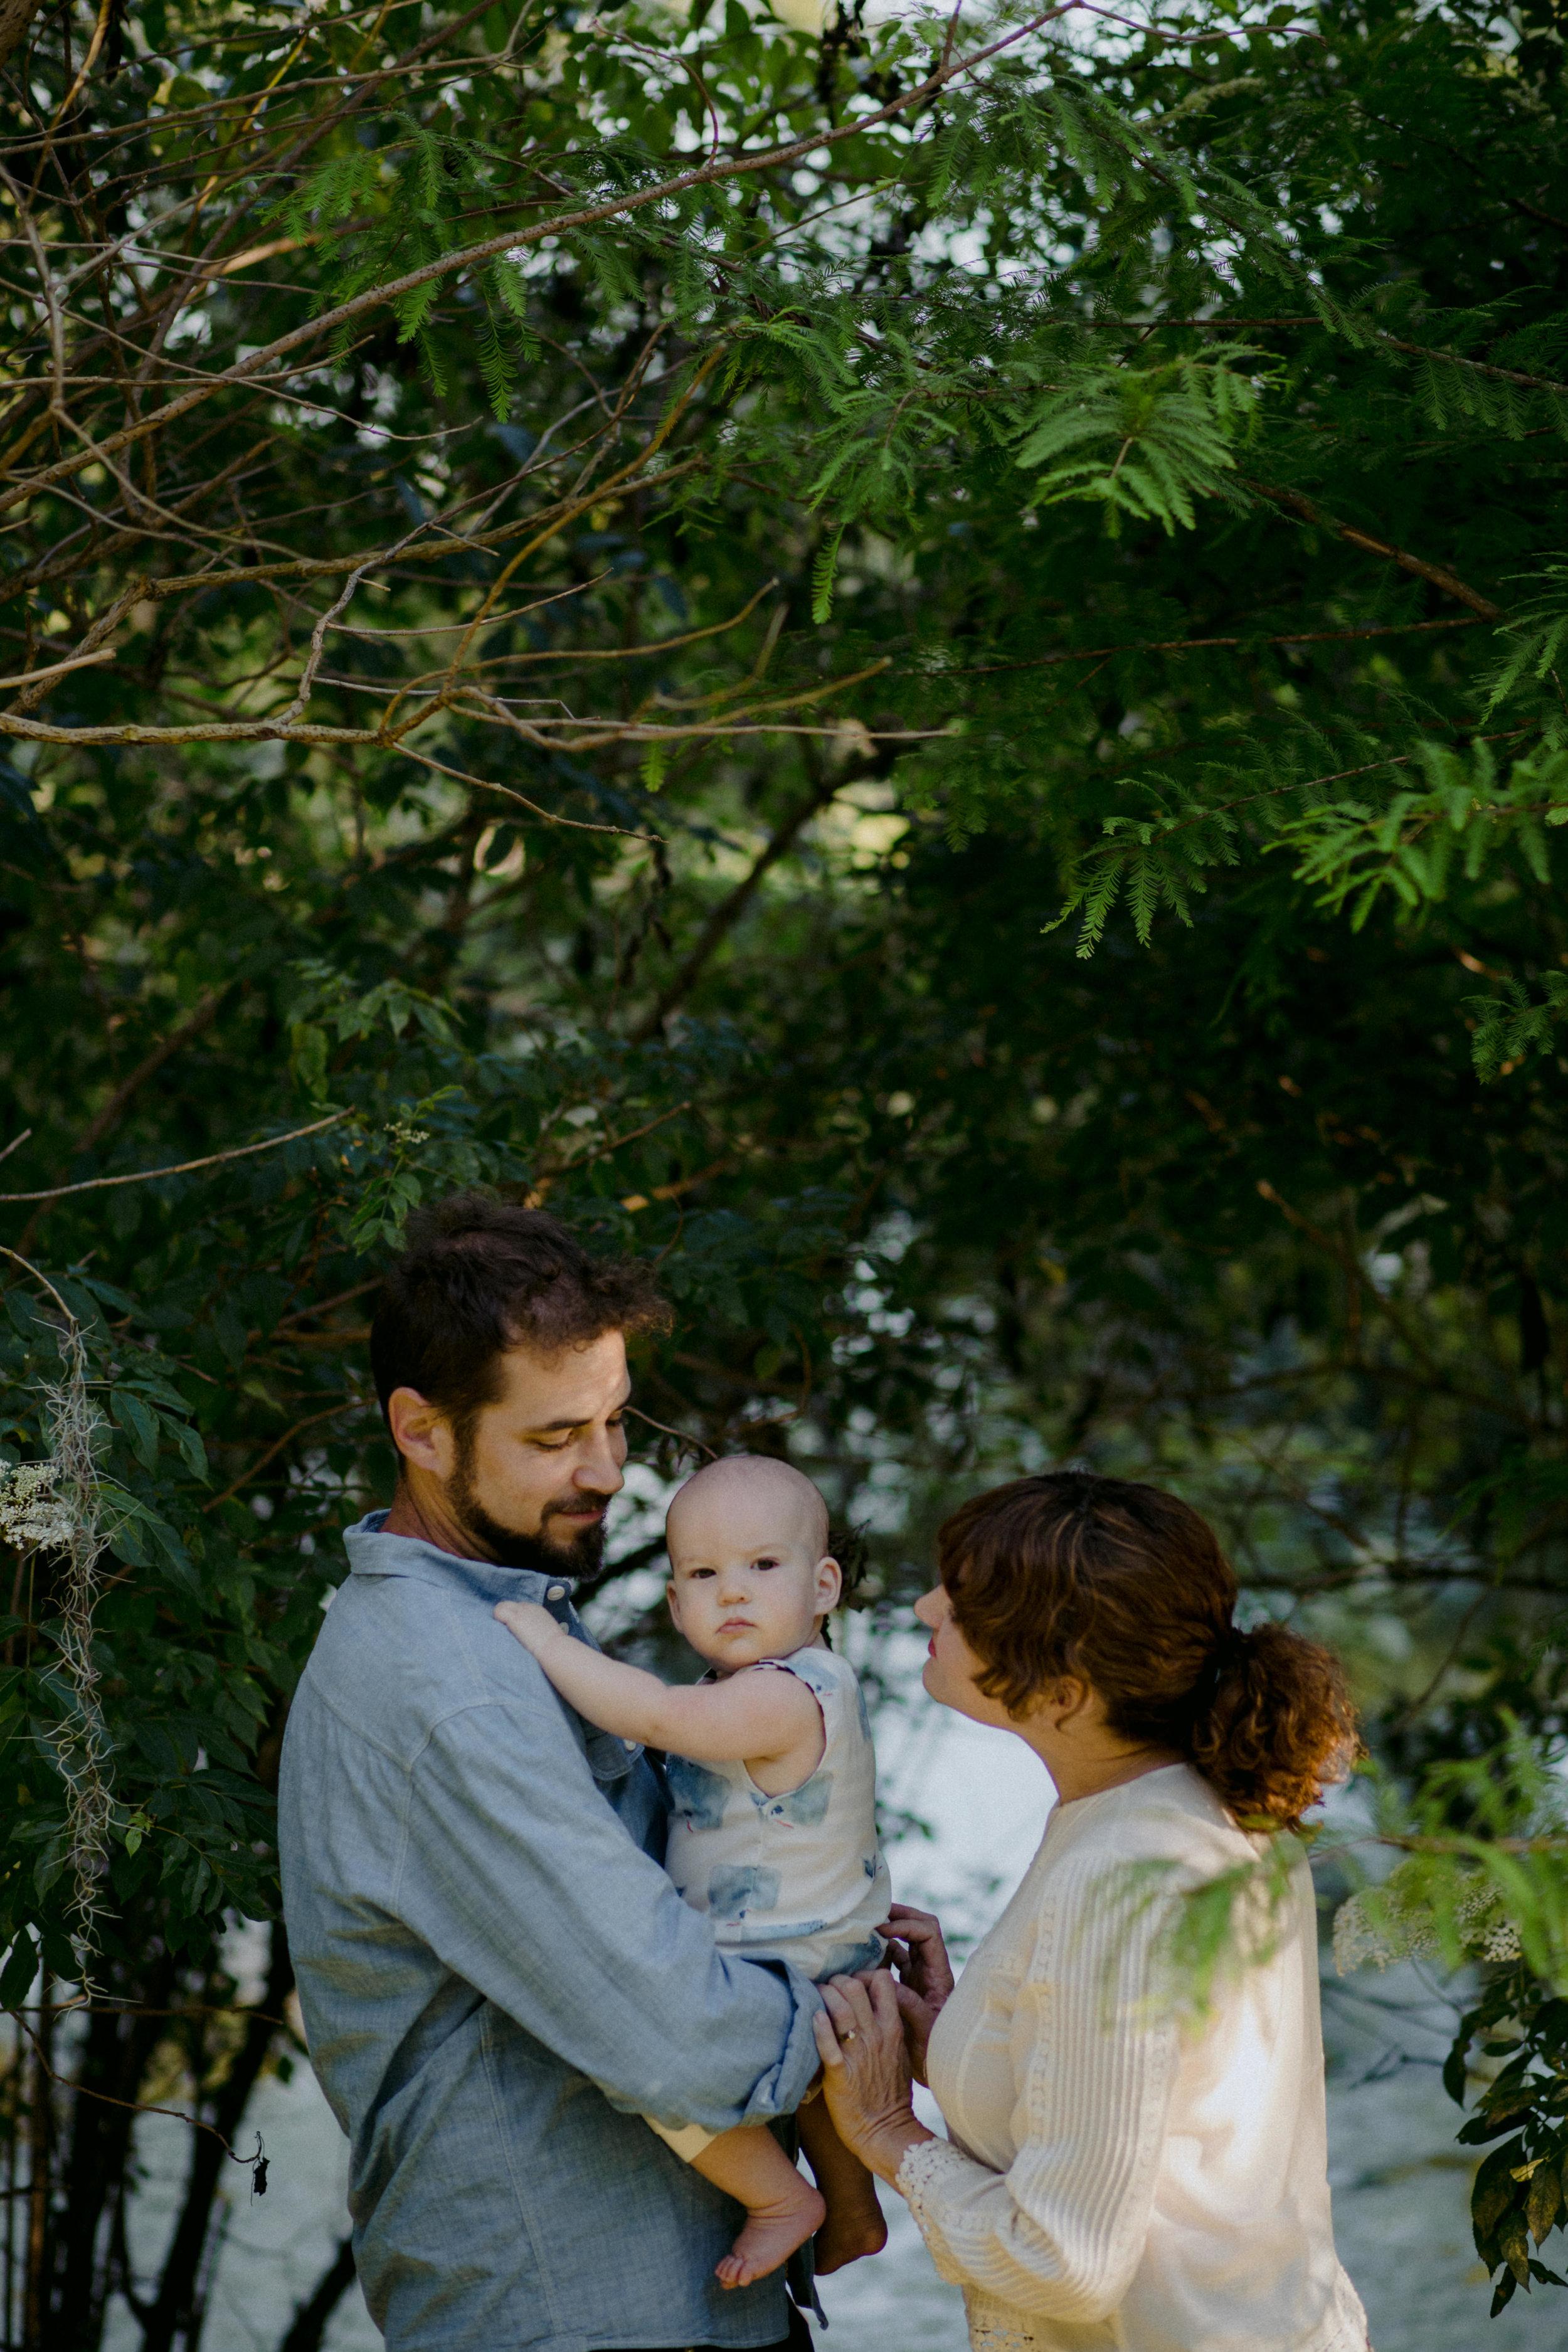 audubon park family shoot-sharon pye-28.jpg